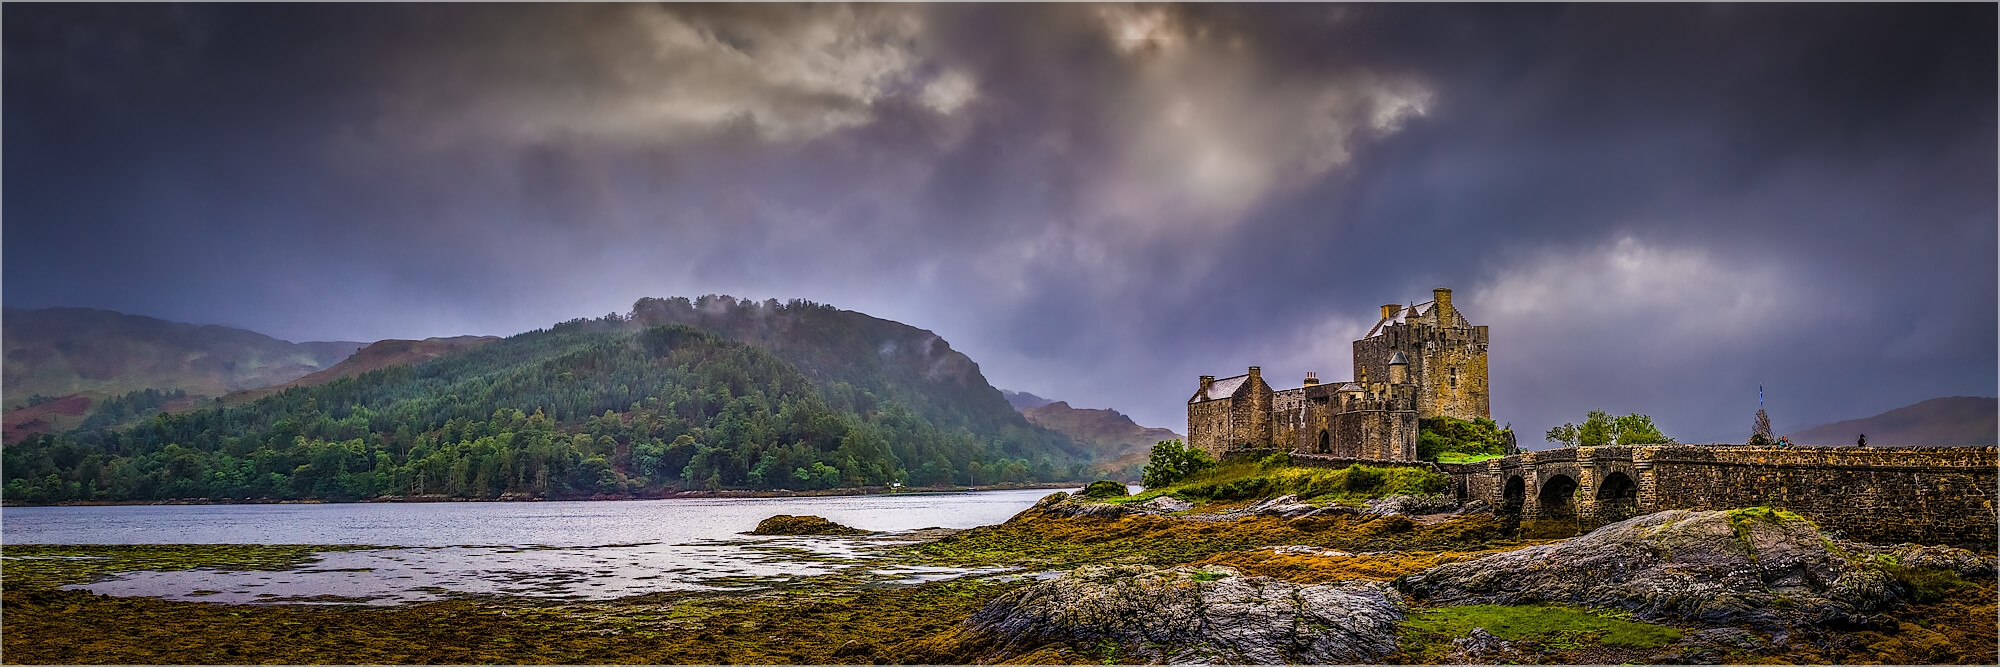 Panoramabild Eilean Donan Castle Highlands Schottland